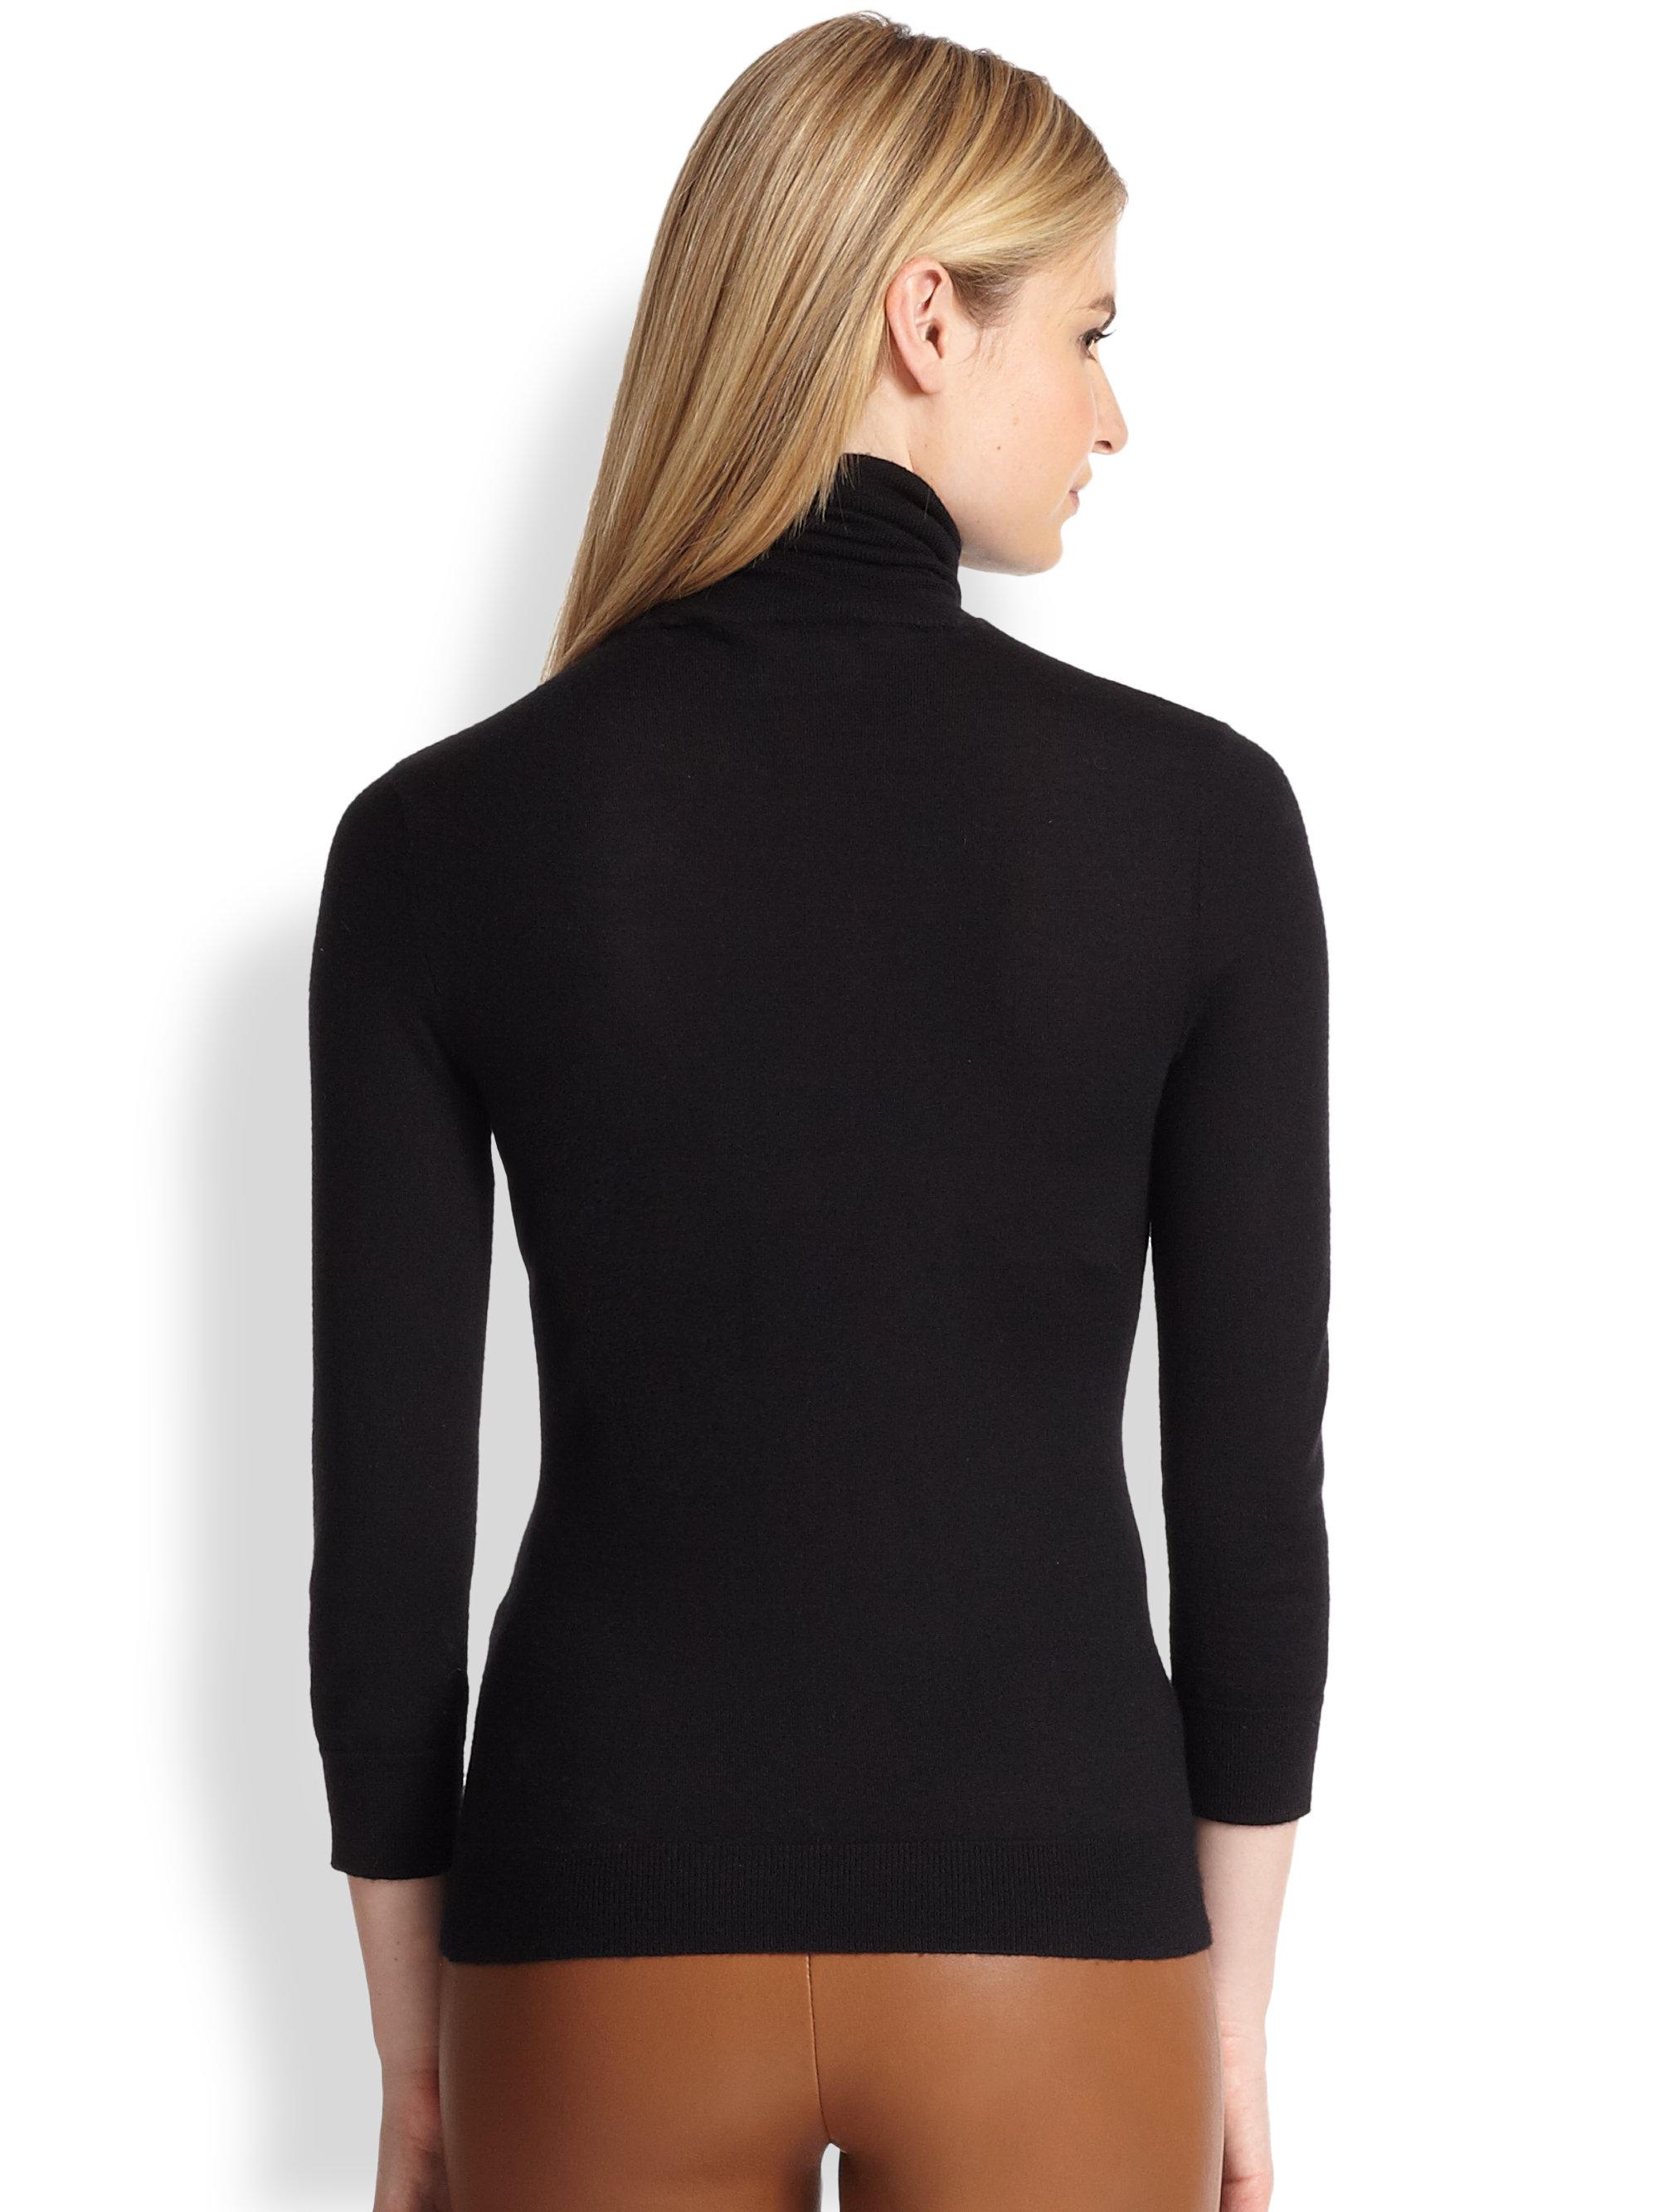 Lyst - Ralph Lauren Black Label Cashmere-silk Knit Tank